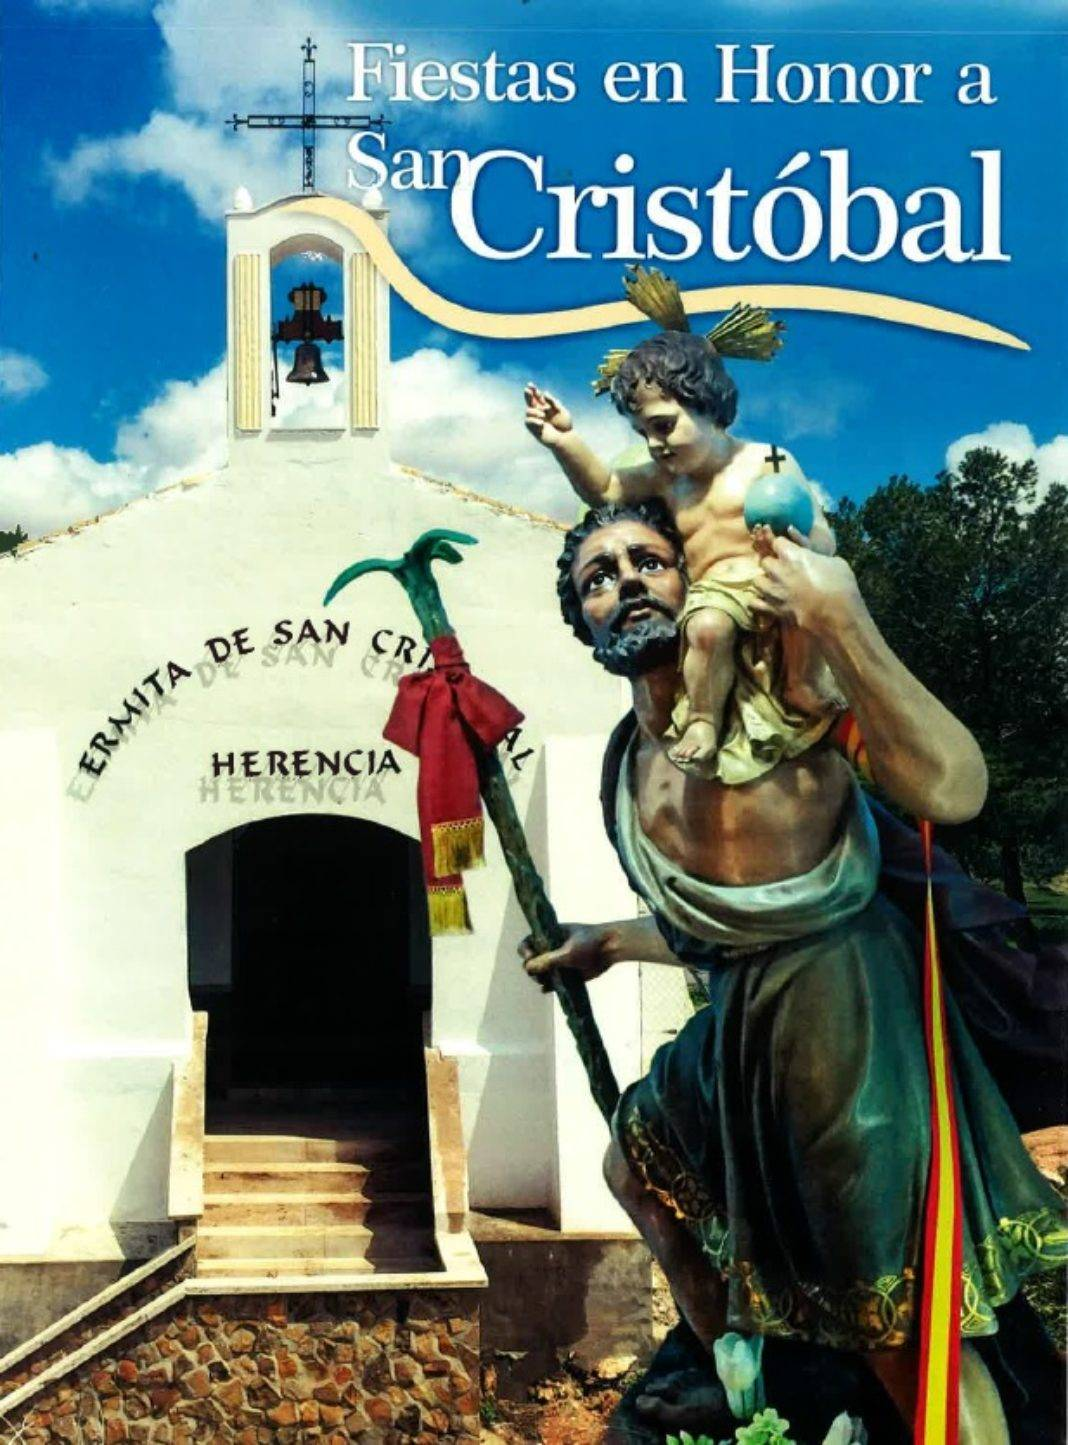 Fiestas en honor a San Cristóbal 1068x1445 - Programa de actos religiosos y festivos en honor a San Cristóbal